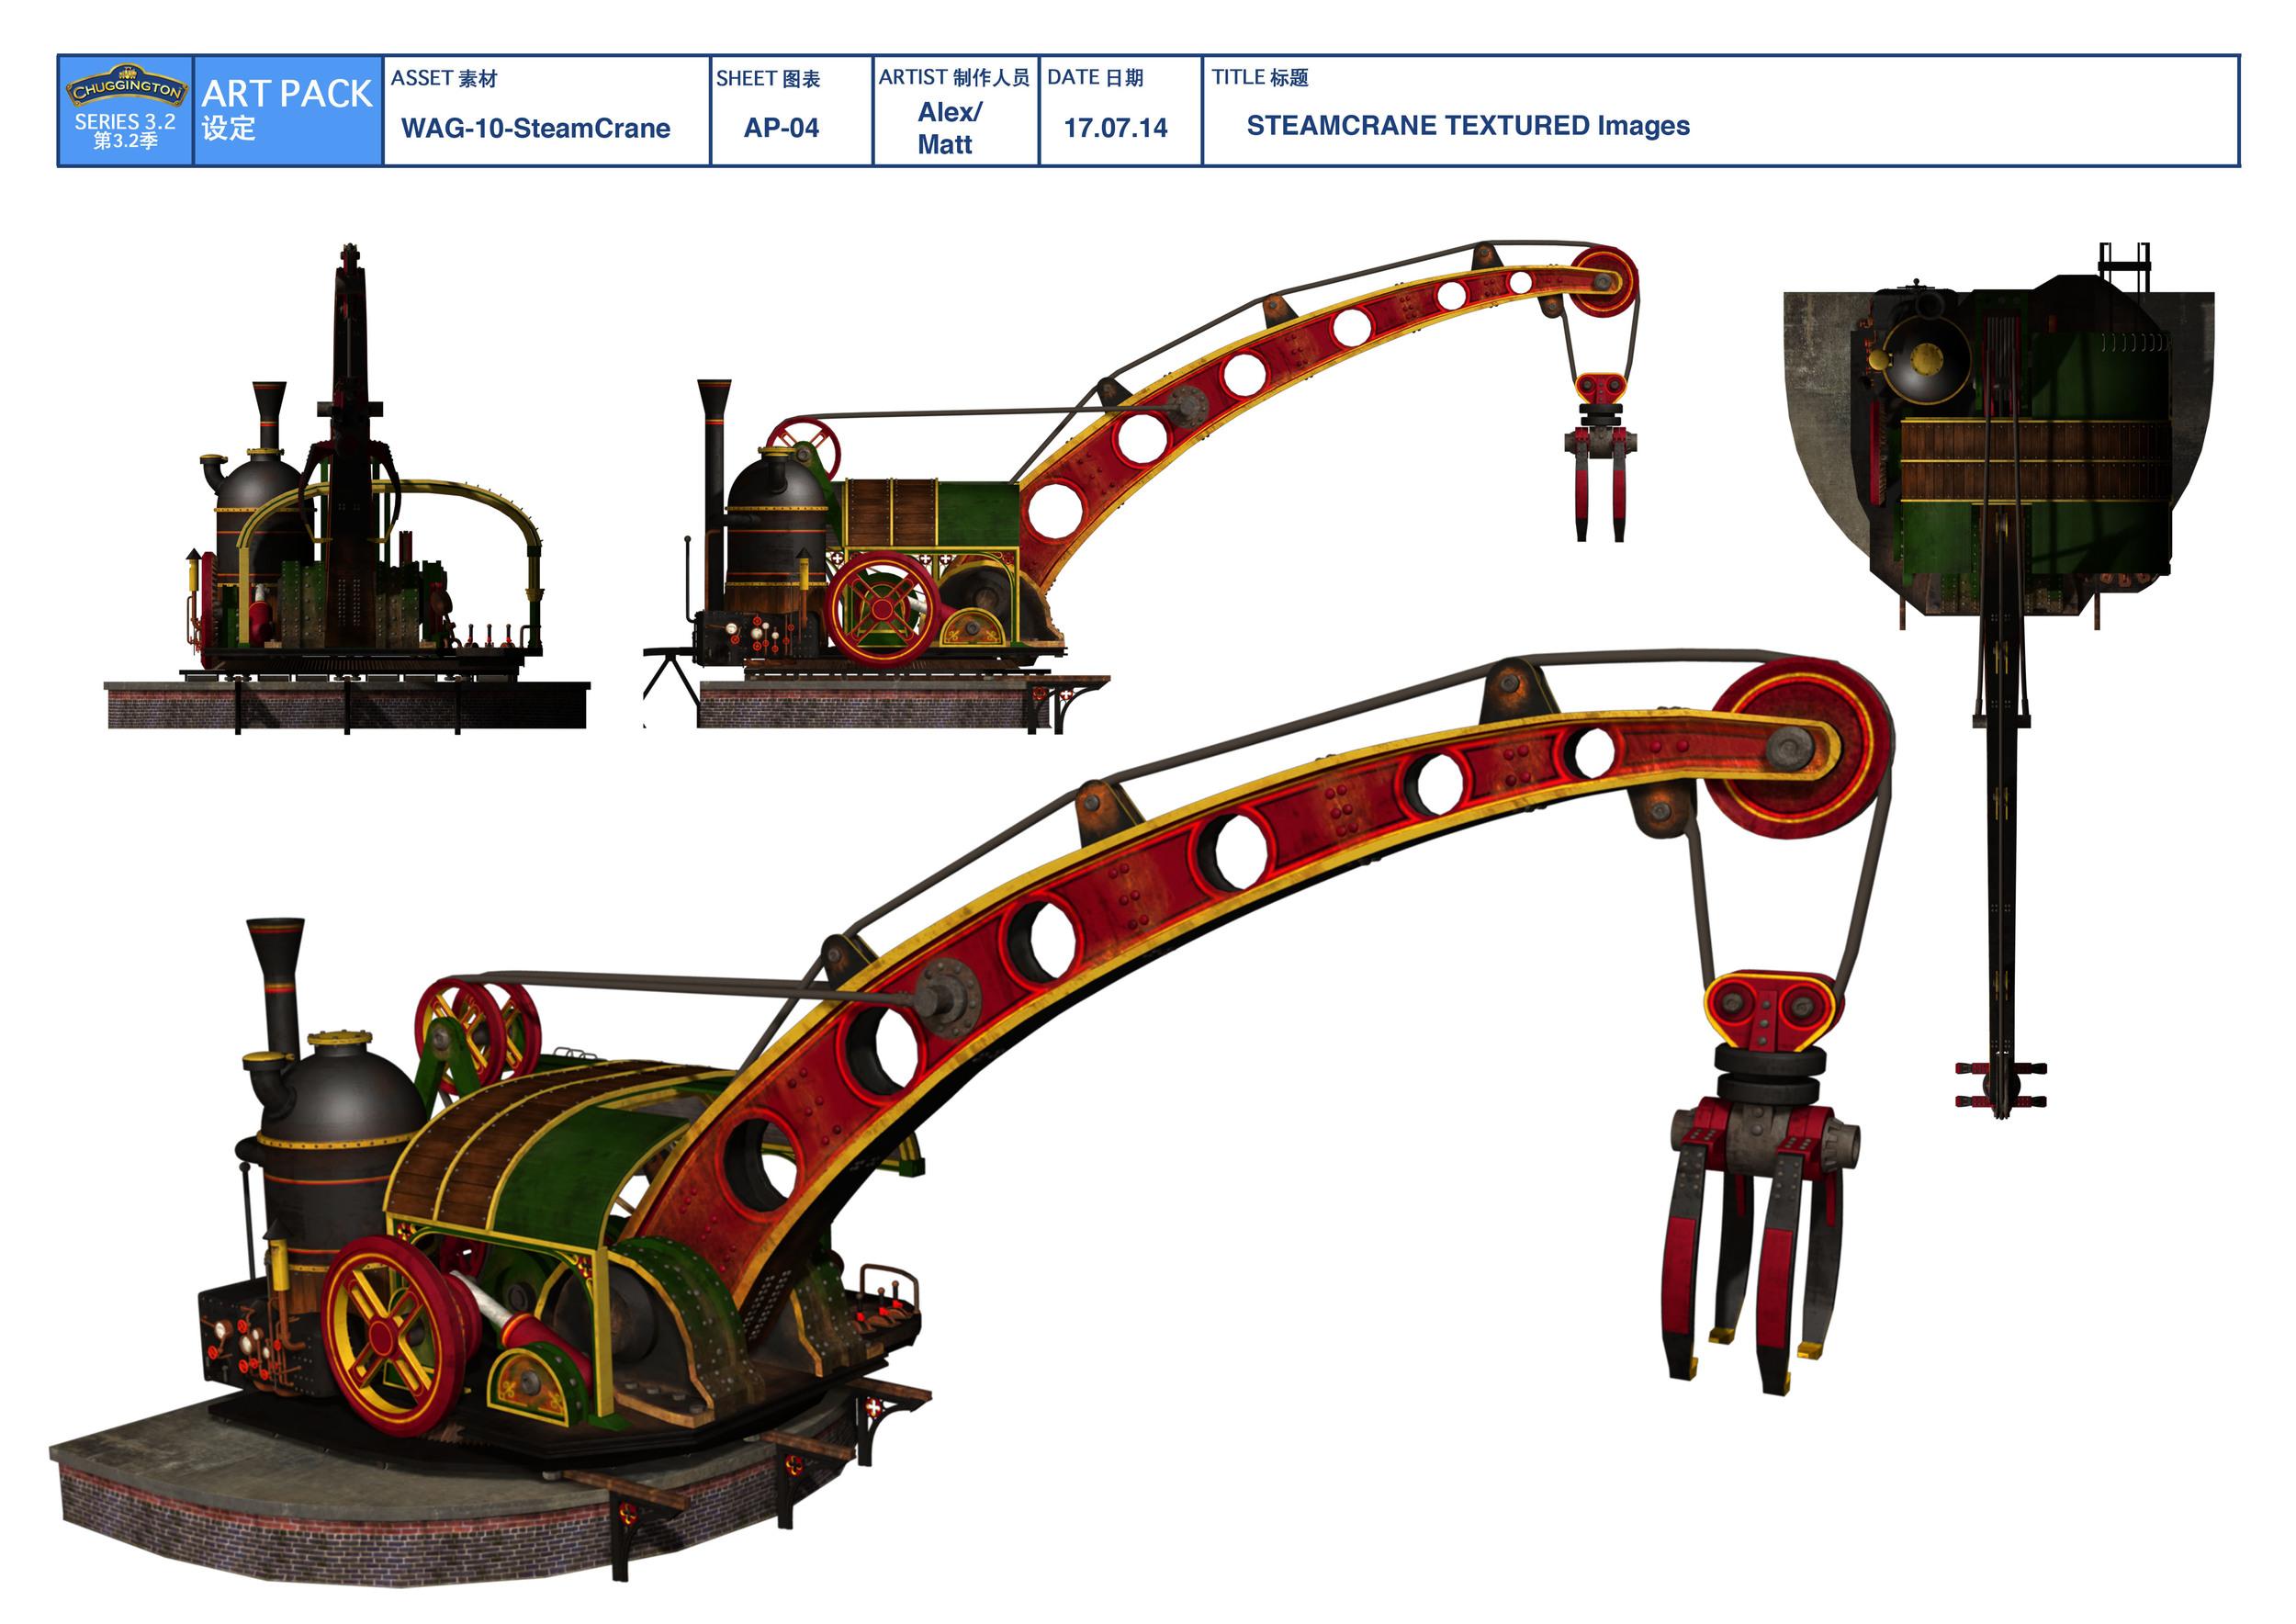 WAG-SteamCrane_AP-04_2014-07-17.jpg